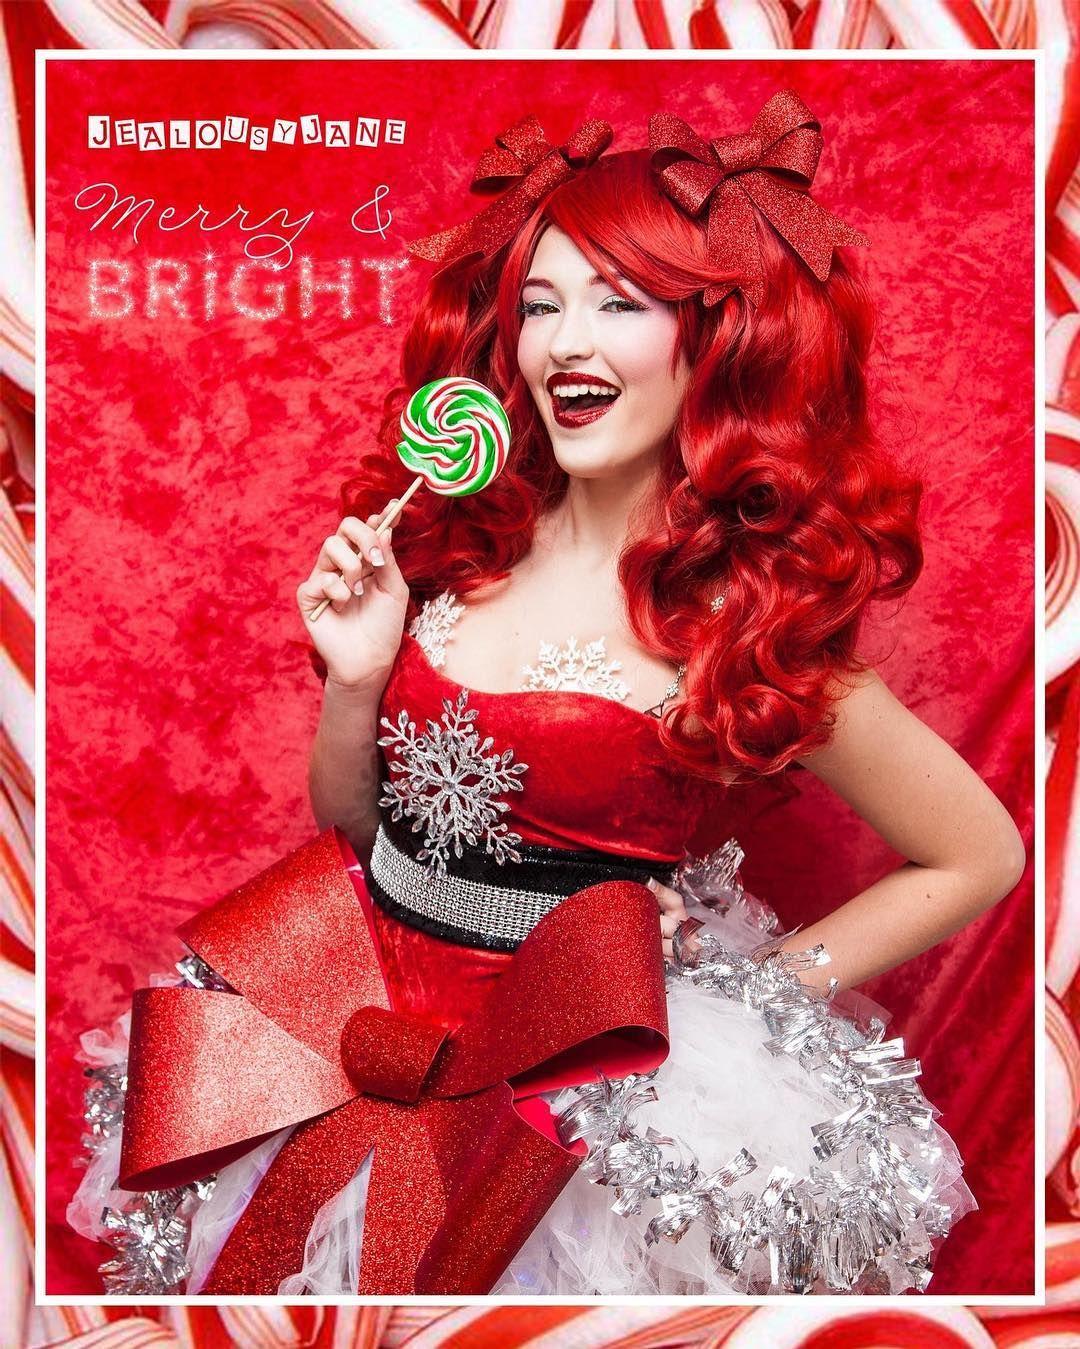 #jealousyjane #candycane #altmodel @jealousyjane #ginger #peppermint #ladygingerbread @dakotabruton.model